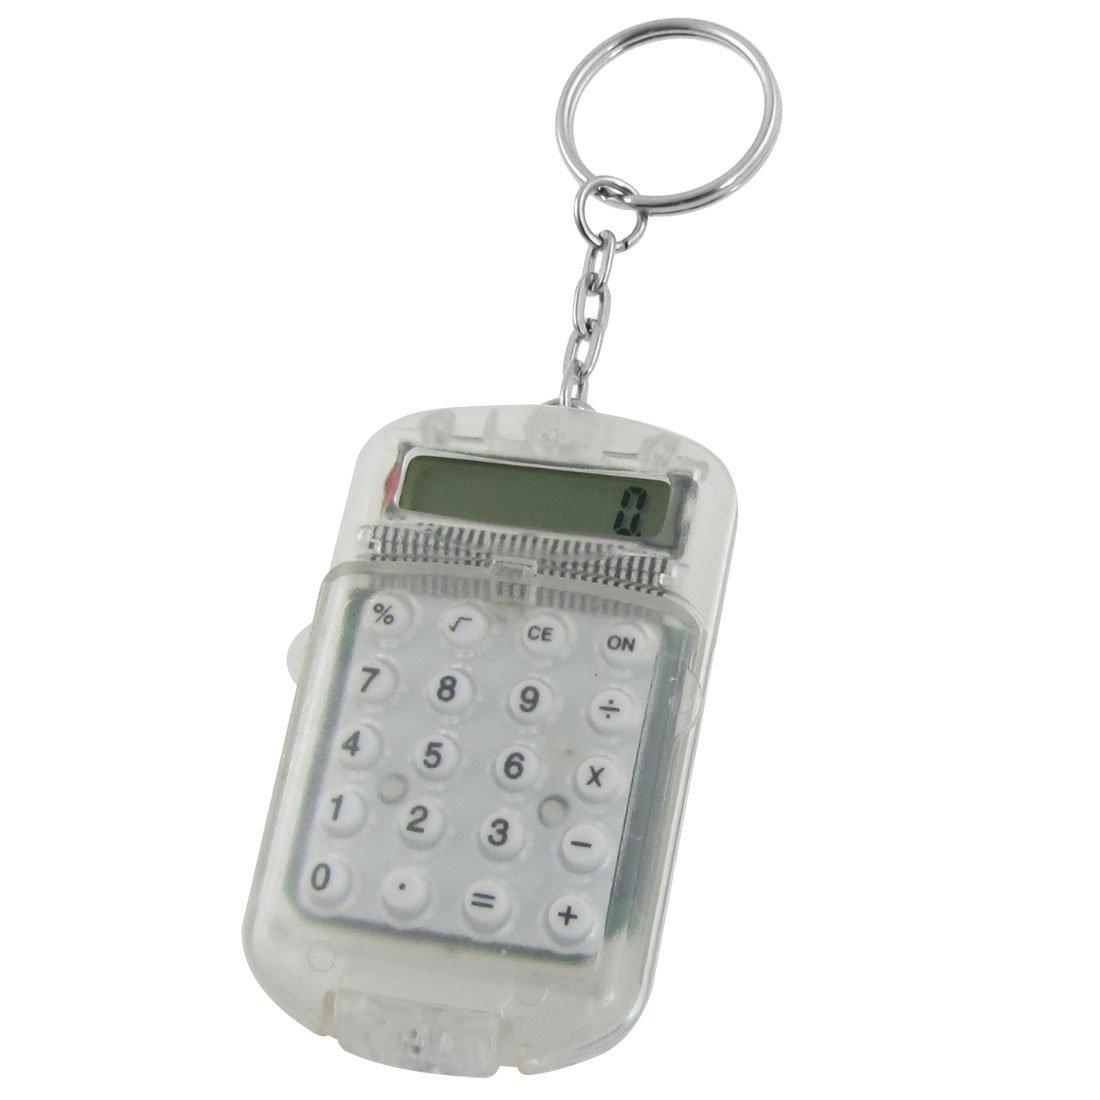 Ясно Пластик корпус 8 цифр электронный мини-калькулятор w брелок